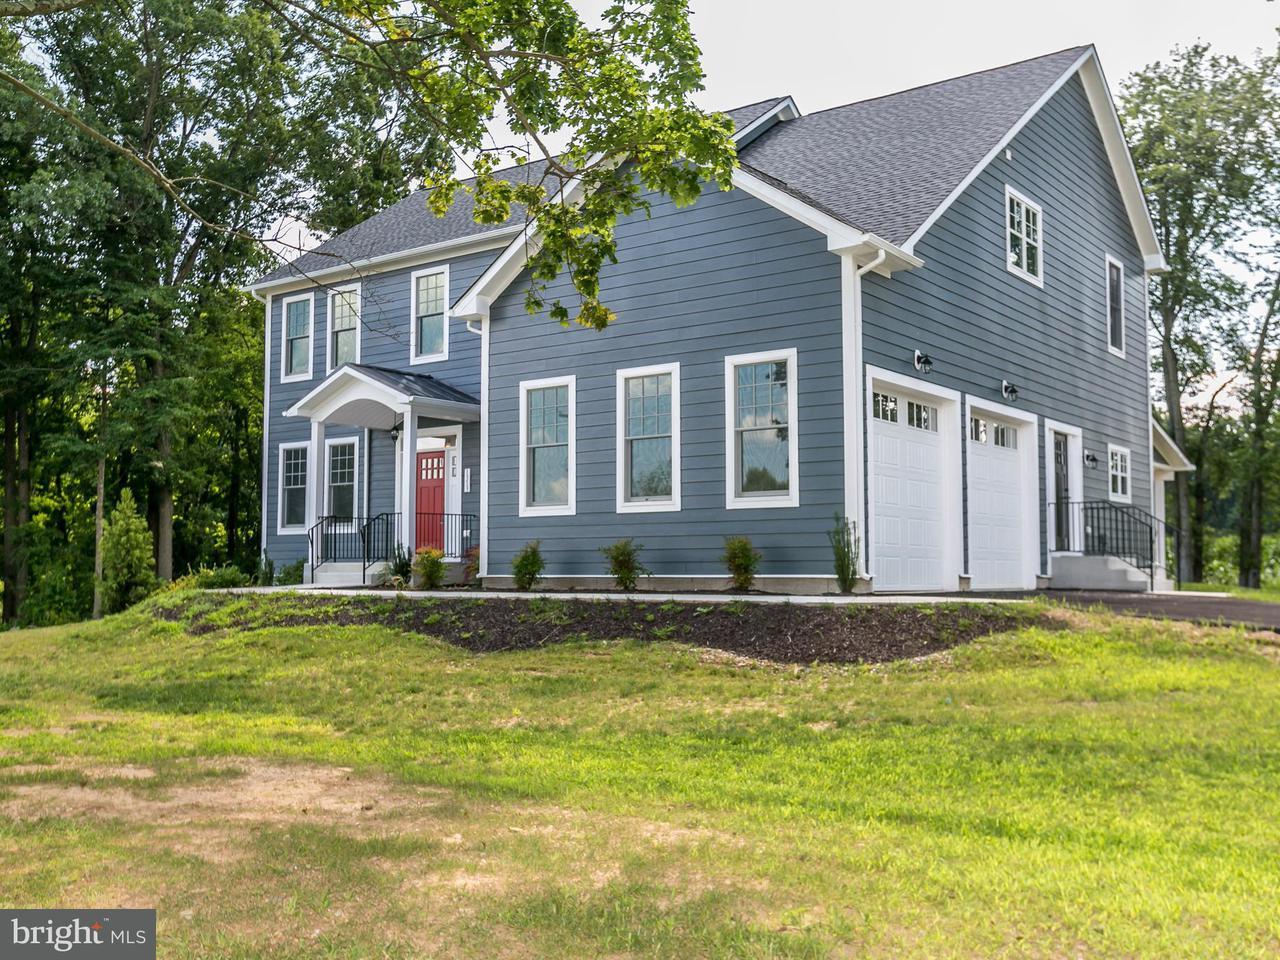 独户住宅 为 销售 在 1313 MONKTON Road 1313 MONKTON Road Monkton, 马里兰州 21111 美国